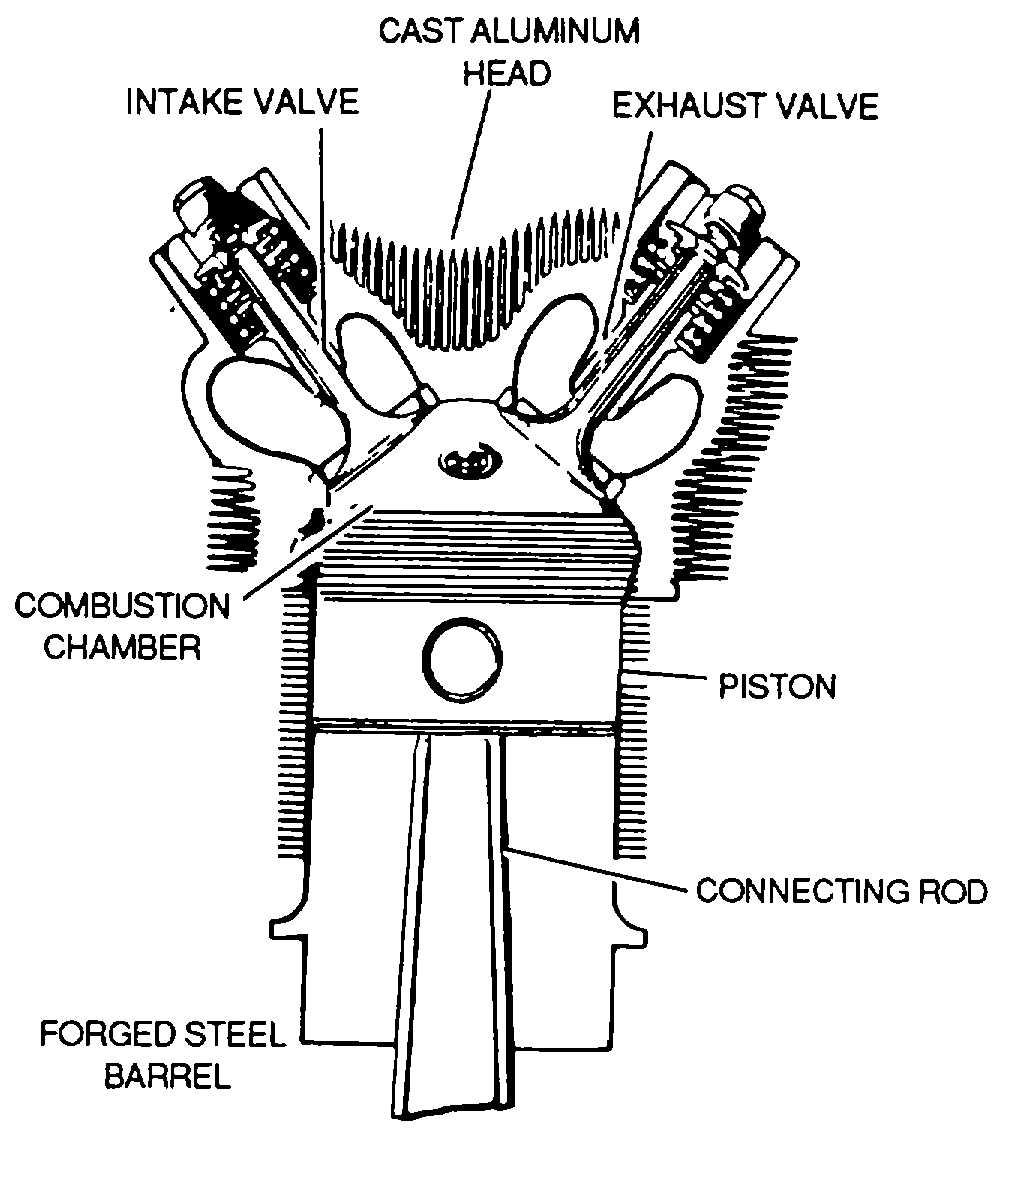 Figure 7-11. Cylinder Assembly